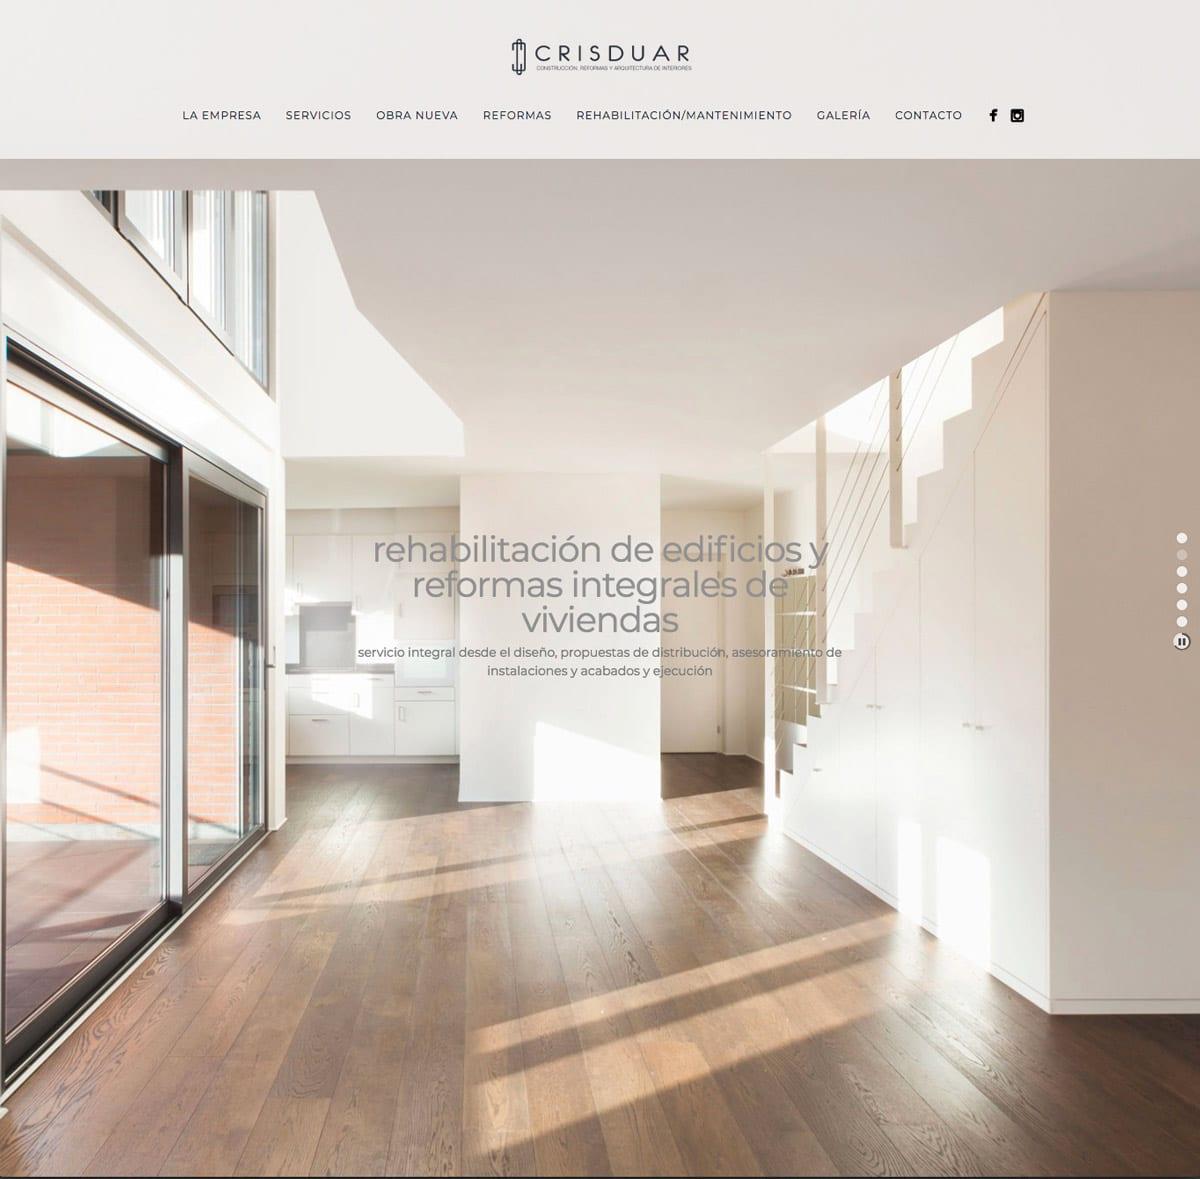 diseño web elegante full size